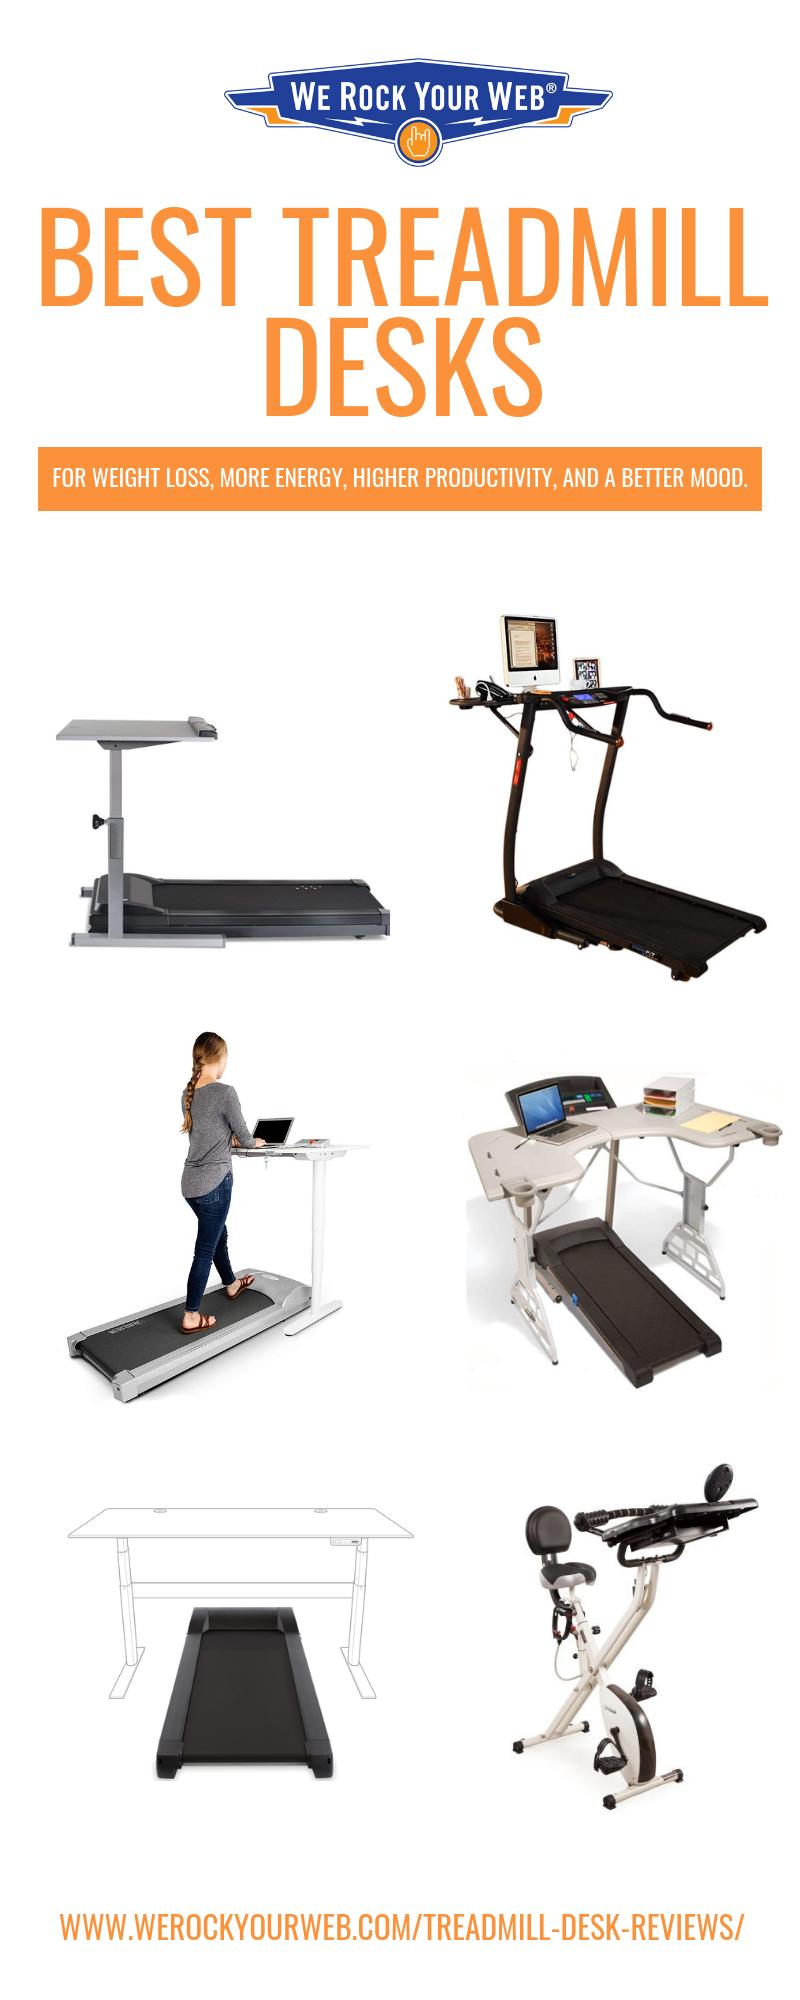 Treadmill Desk Reviews Fitdesk Vs Exerpeutic Vs Xdesk Vs